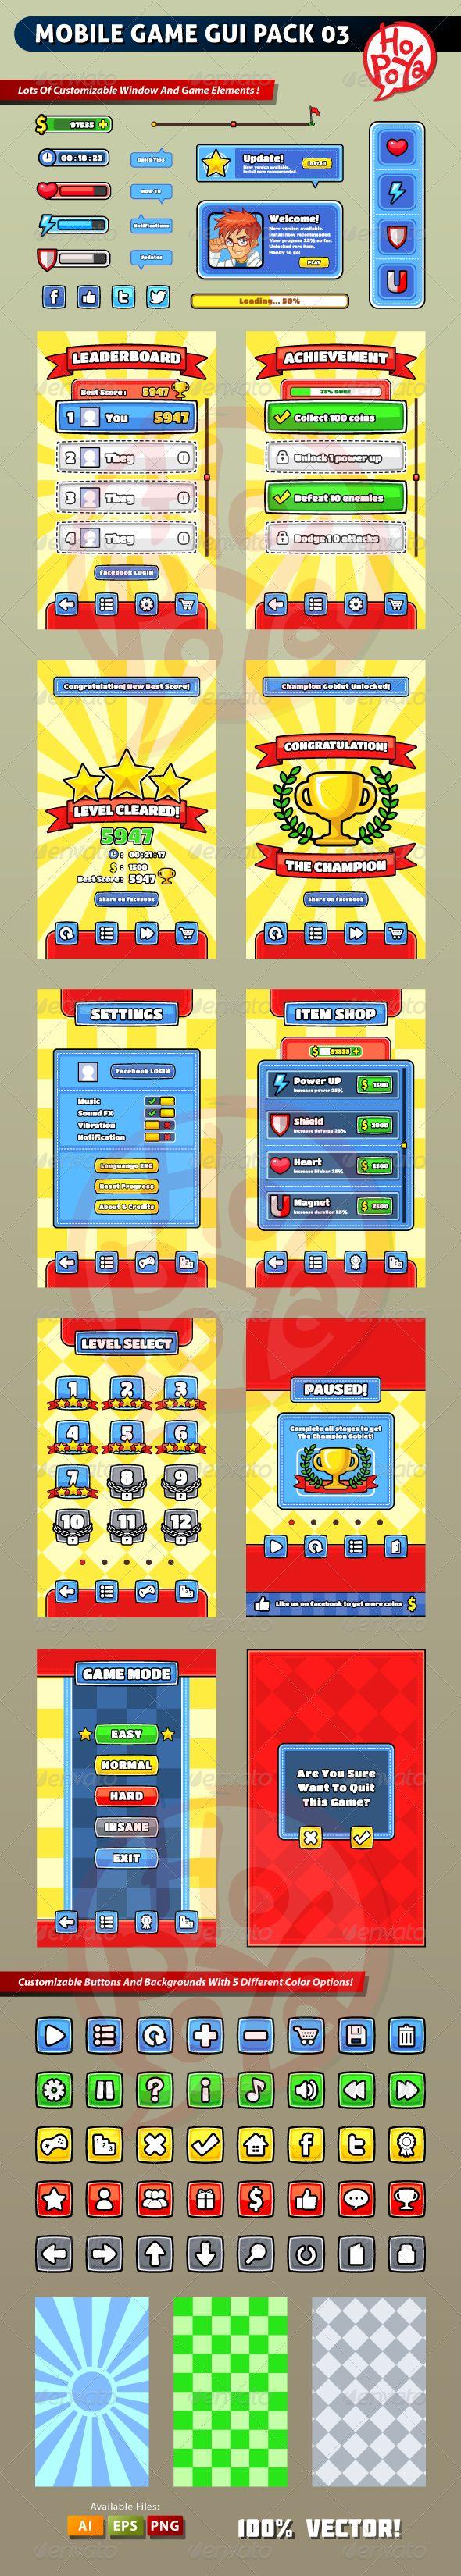 Mobile Game GUI Pack 03 - Web Elements Vectors